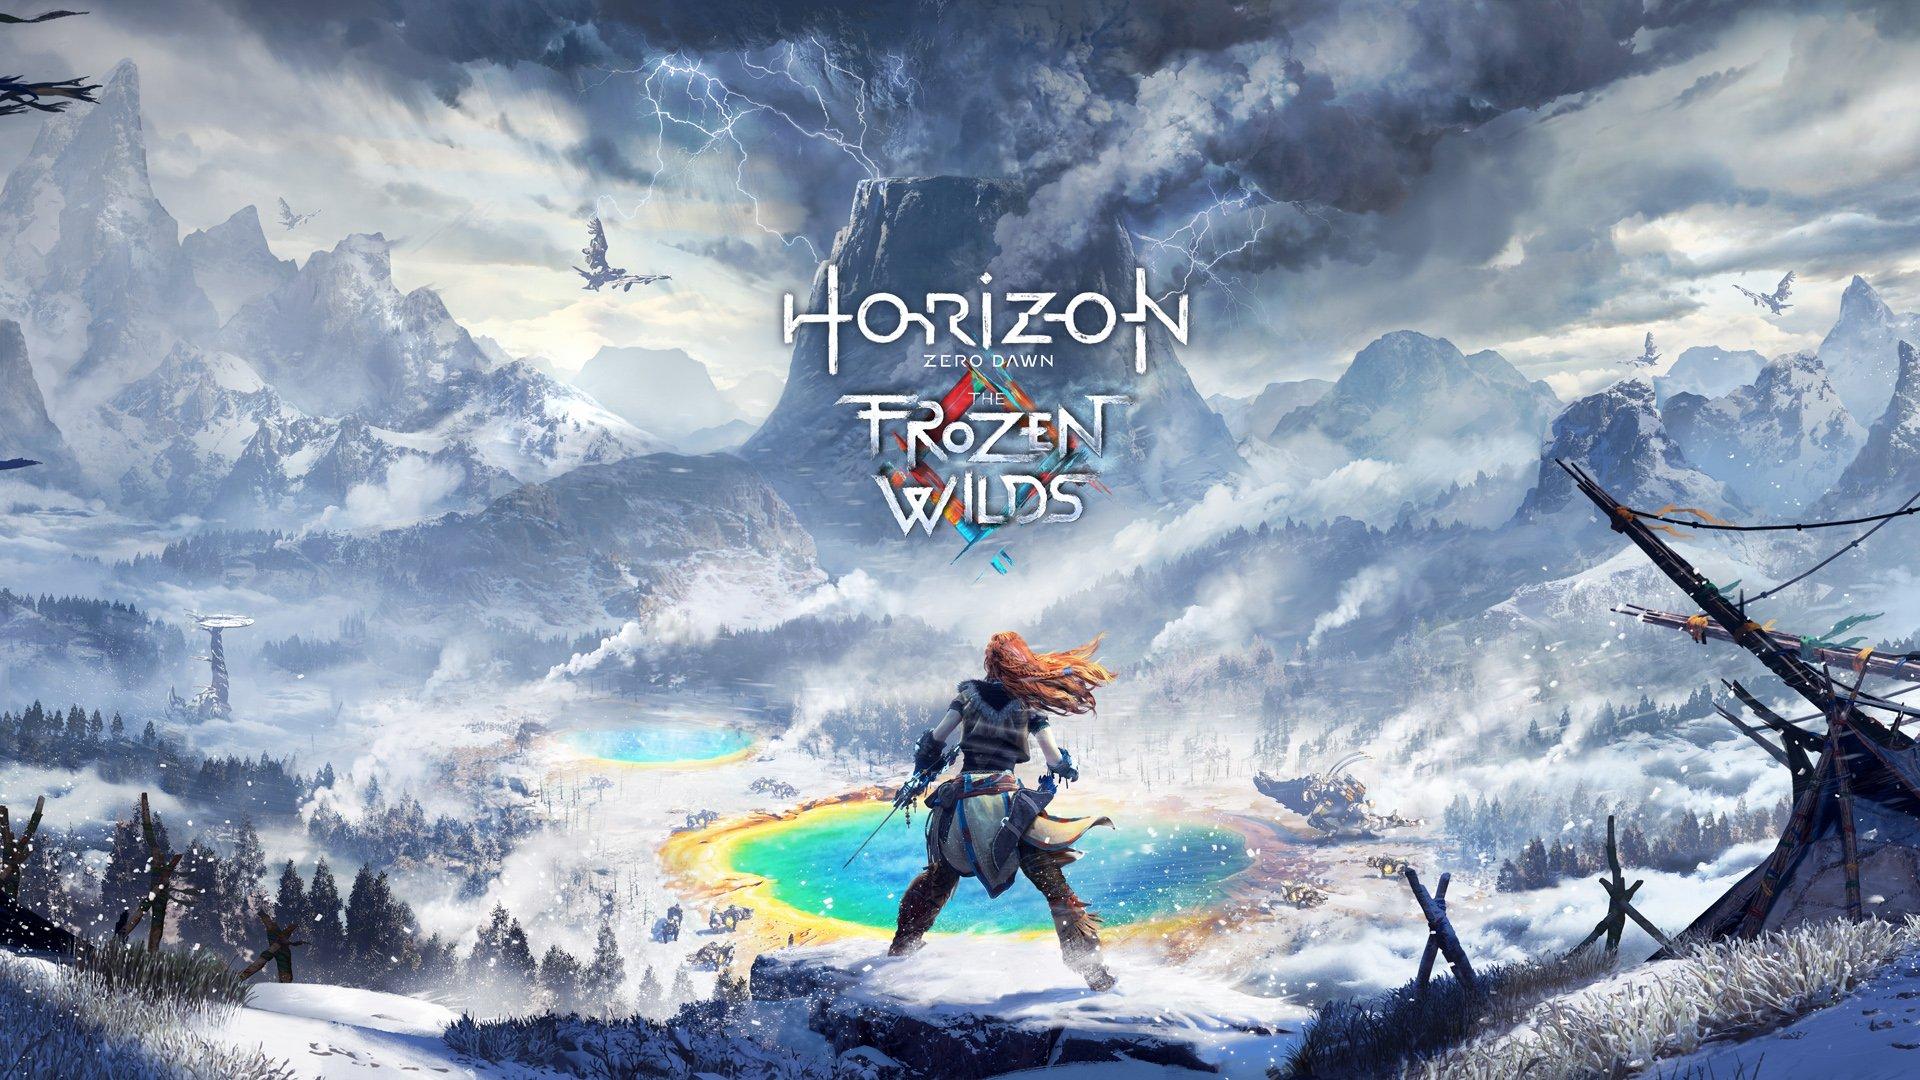 Торговая марка Horizon Zero Dawn — The Frozen Wilds приостановлена патентным бюро США